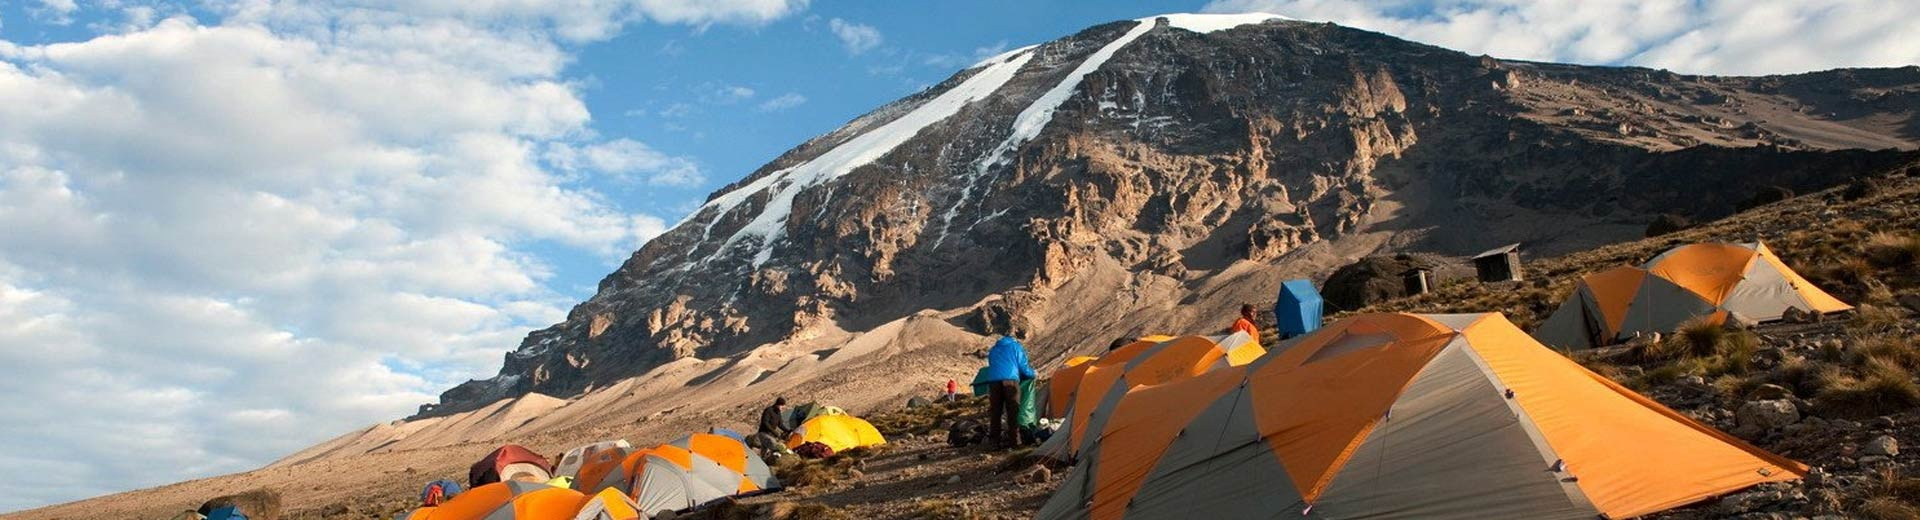 Kilimanjaro 6 Day Machame Route